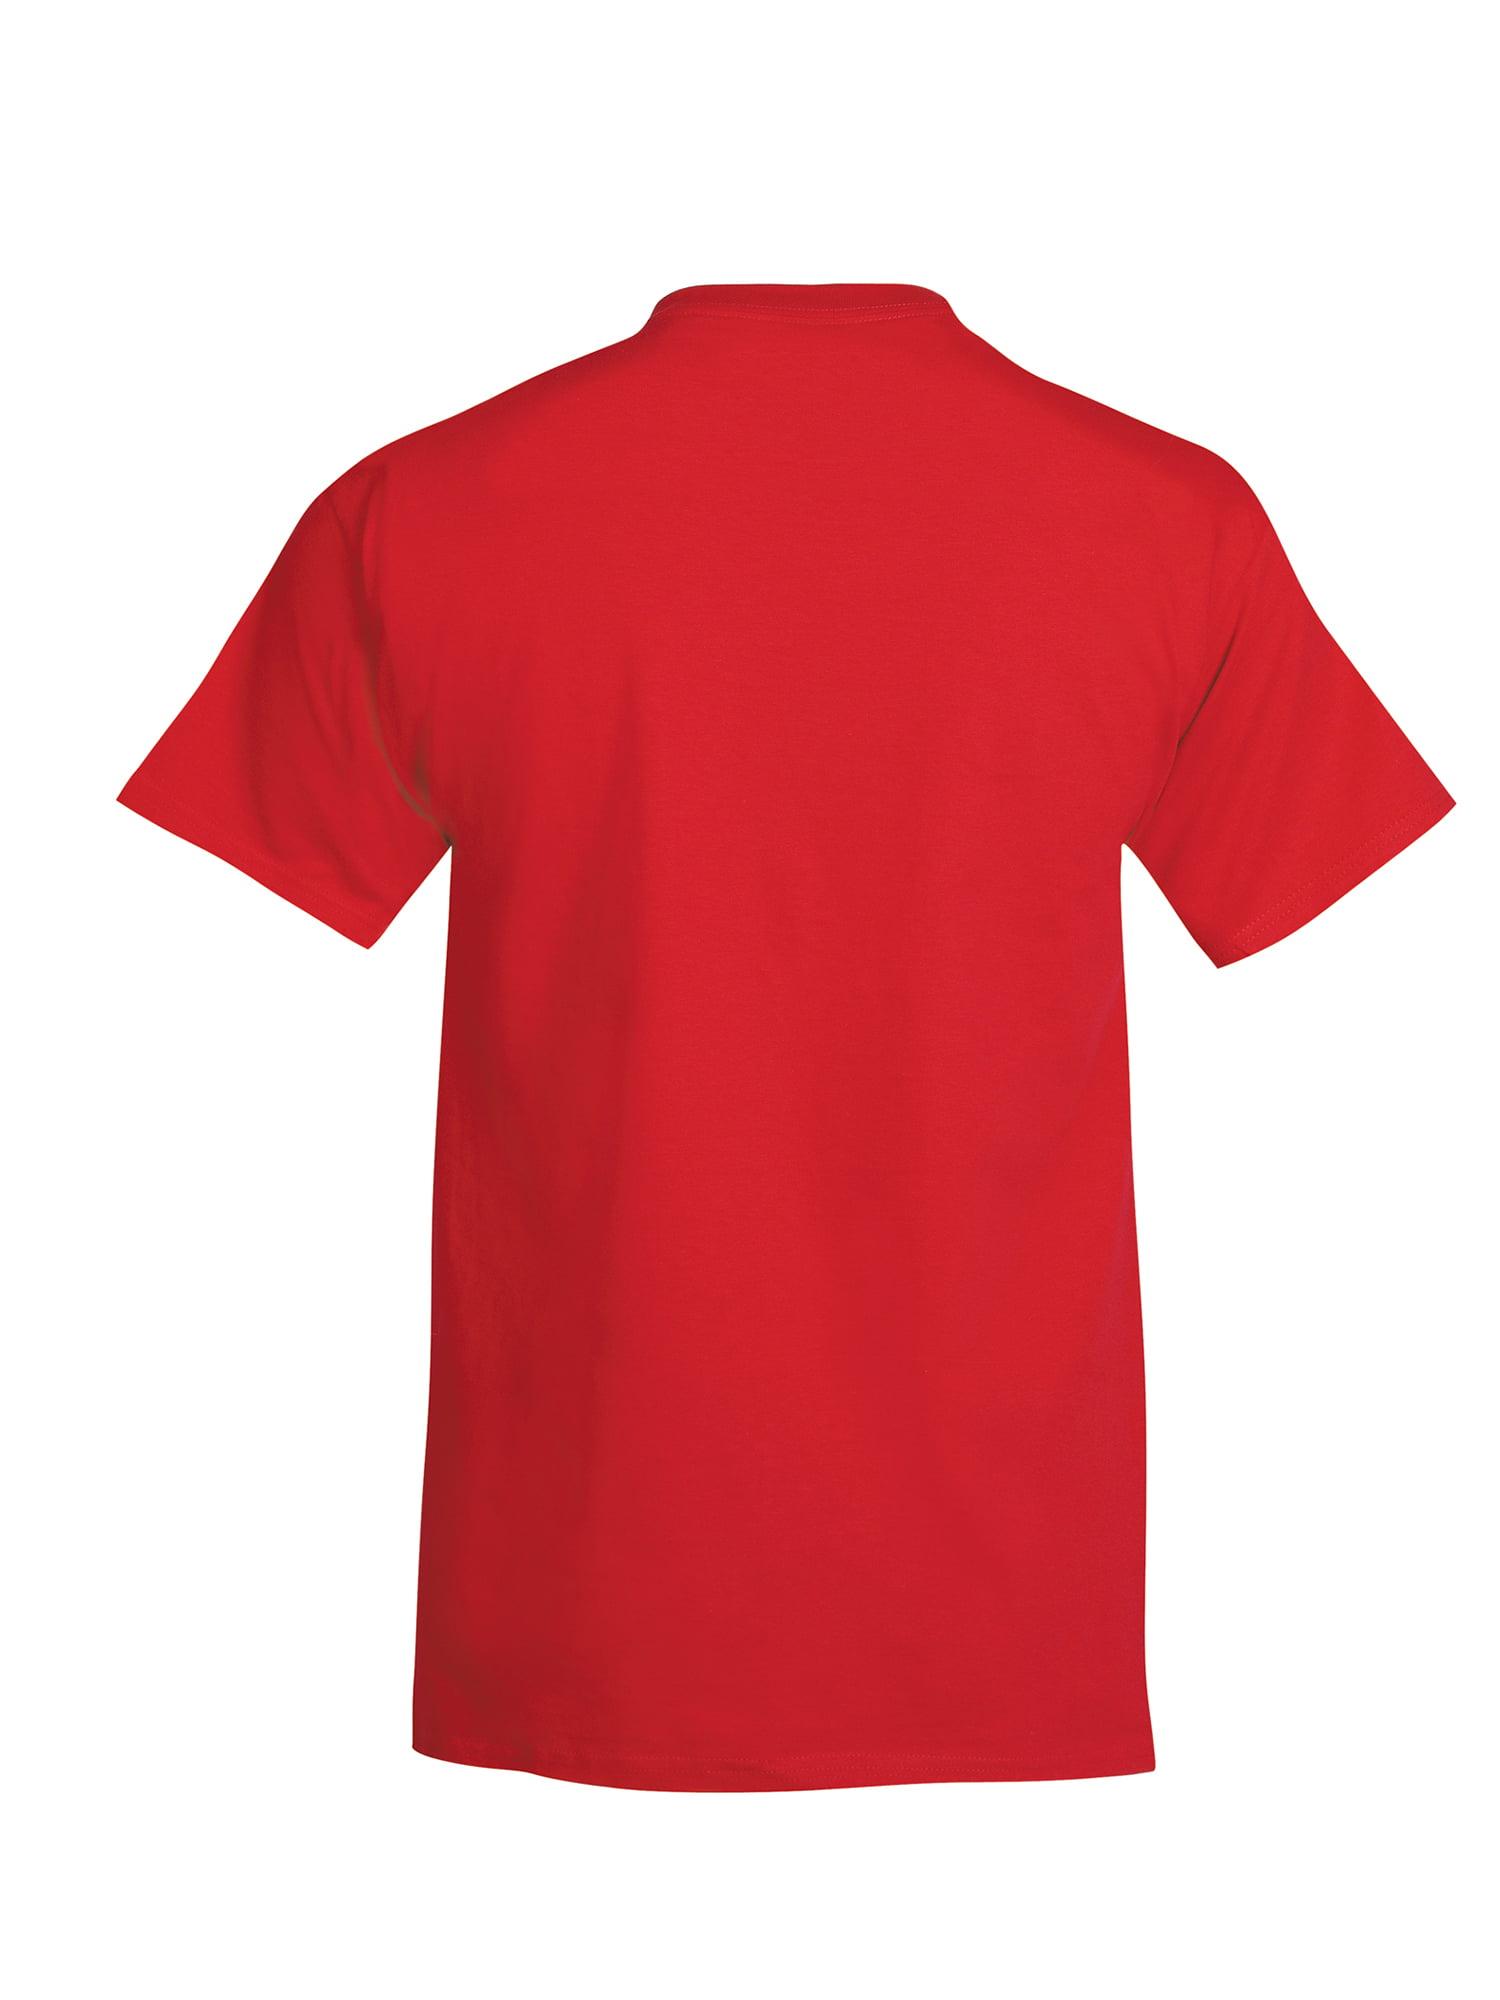 Hanes - Hanes Men s Beefy-T Crew Neck Short Sleeve T-Shirt 313db39ce